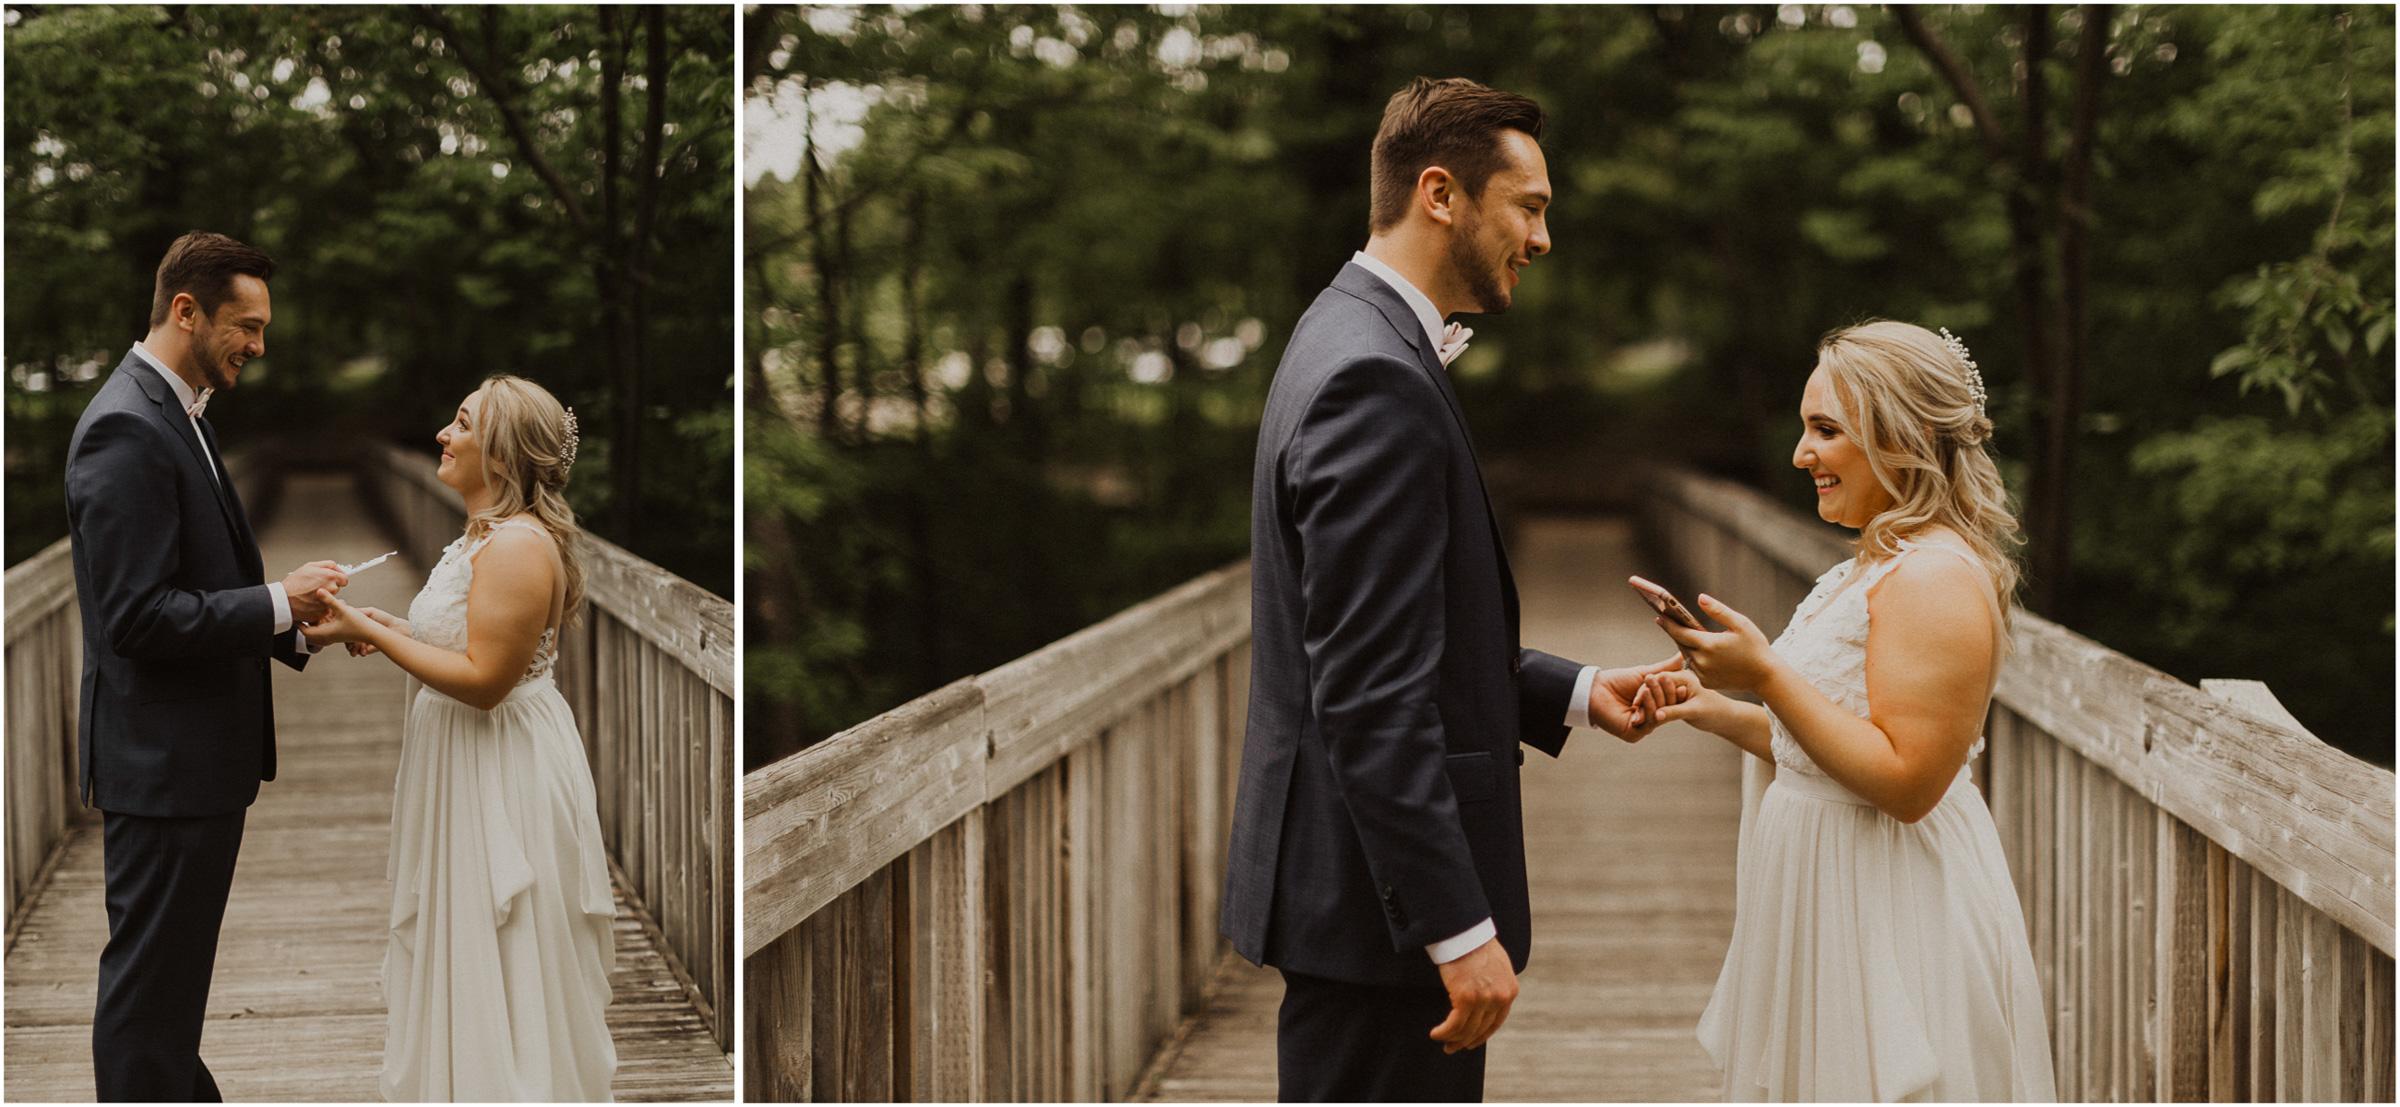 alyssa barletter photography nelson wedding nebraska city lied lodge morton barn spring wedding photographer-9.jpg